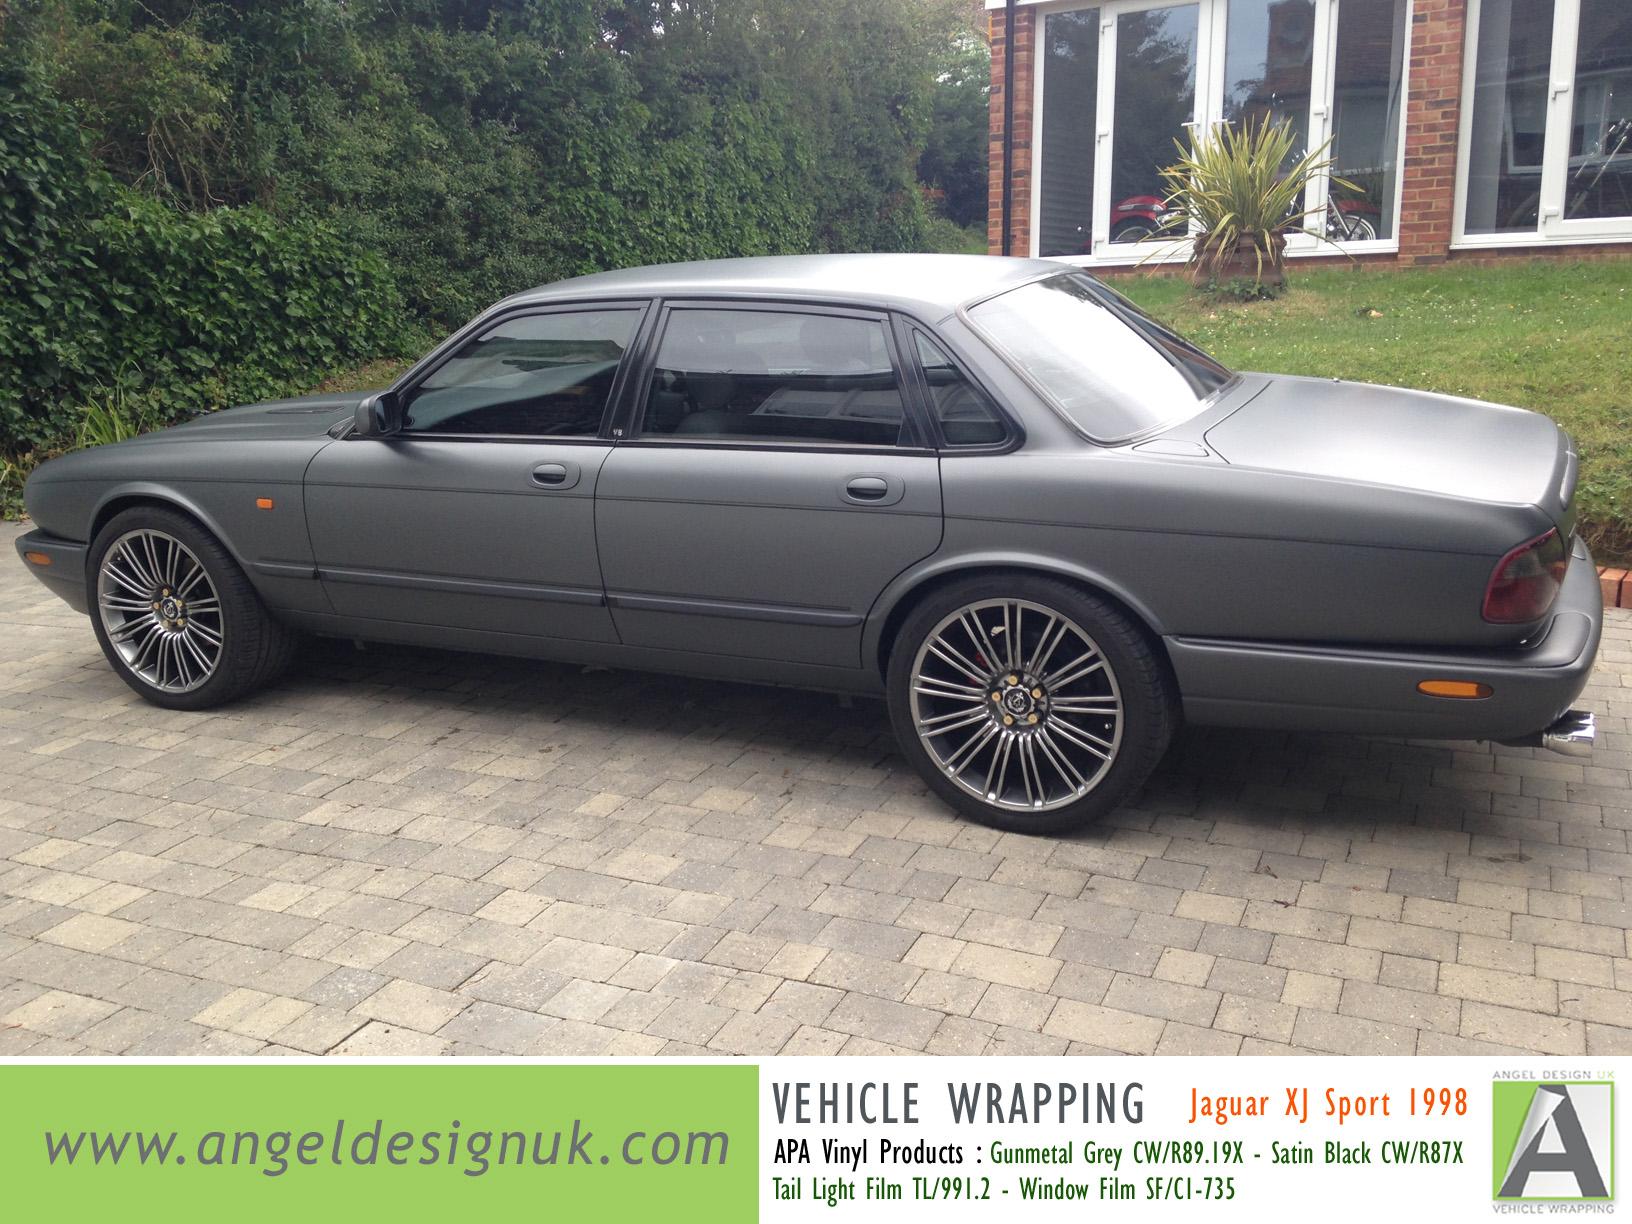 ANGEL DESIGN UK Vehicle Wrapping Jaguar XJ Sport 1998 Gunmetal Grey Pic 2